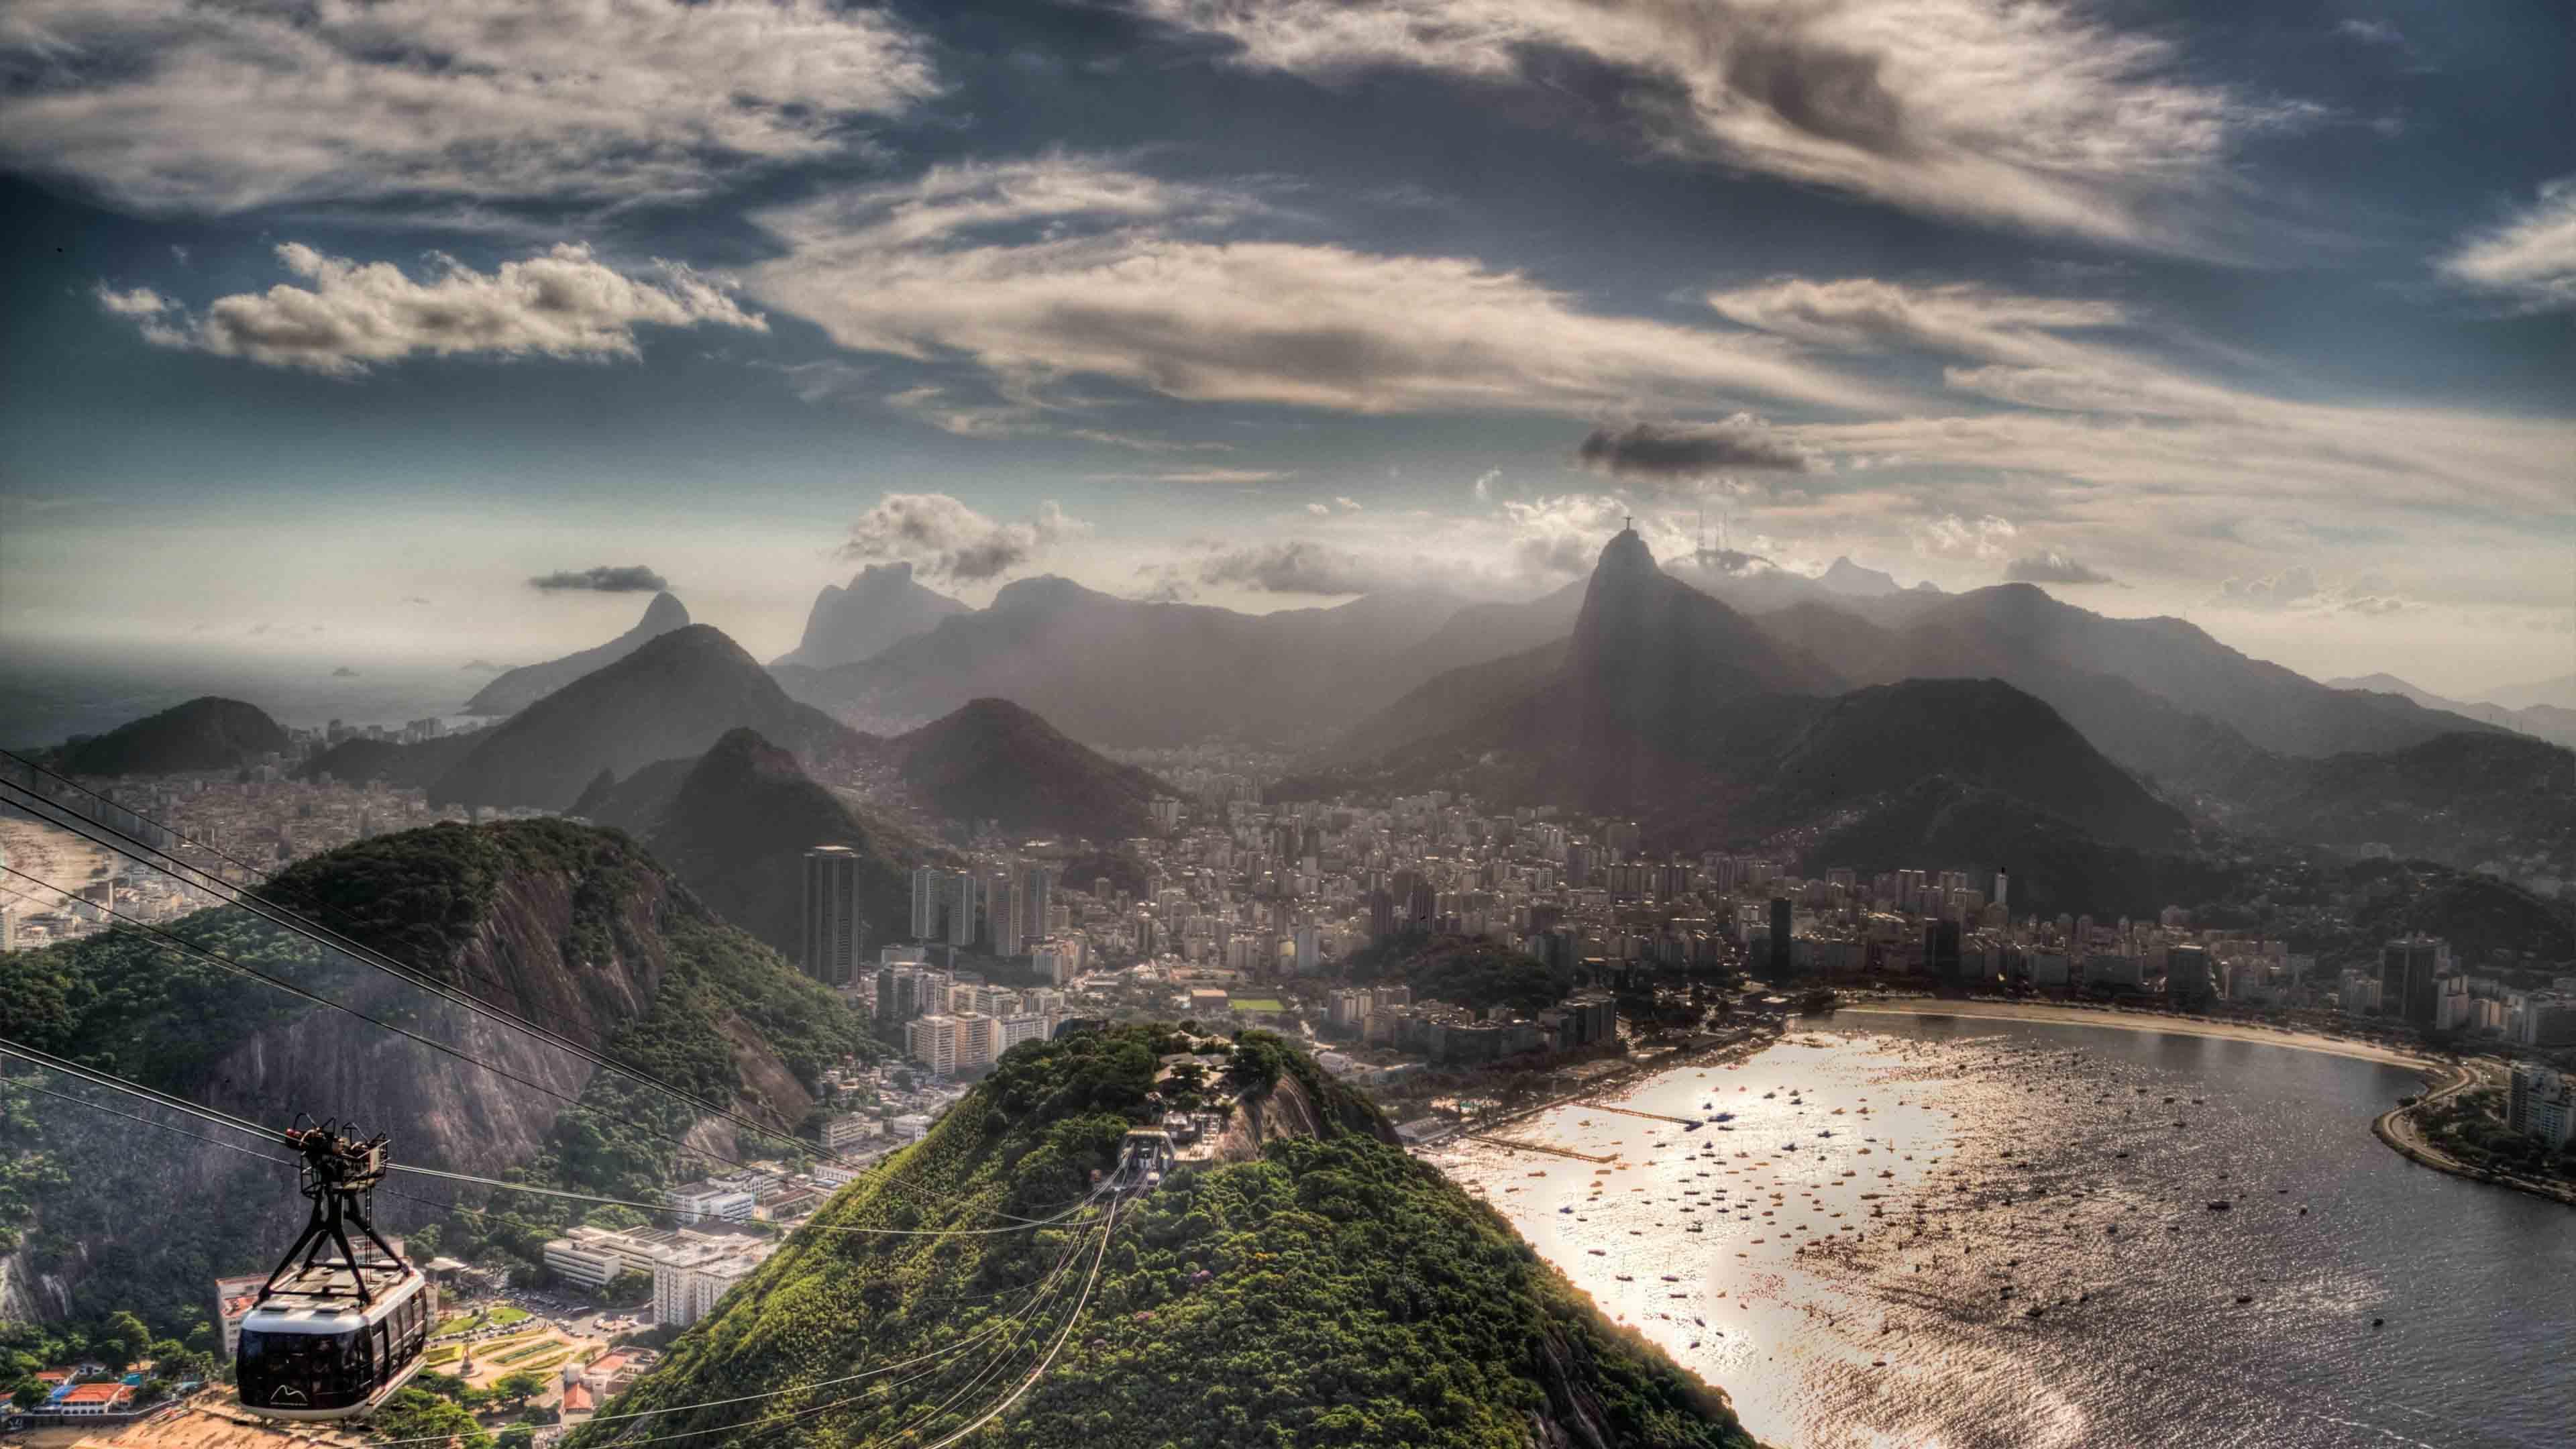 Rio De Janeiro South America Beautiful City Wallpaper 3840x2160